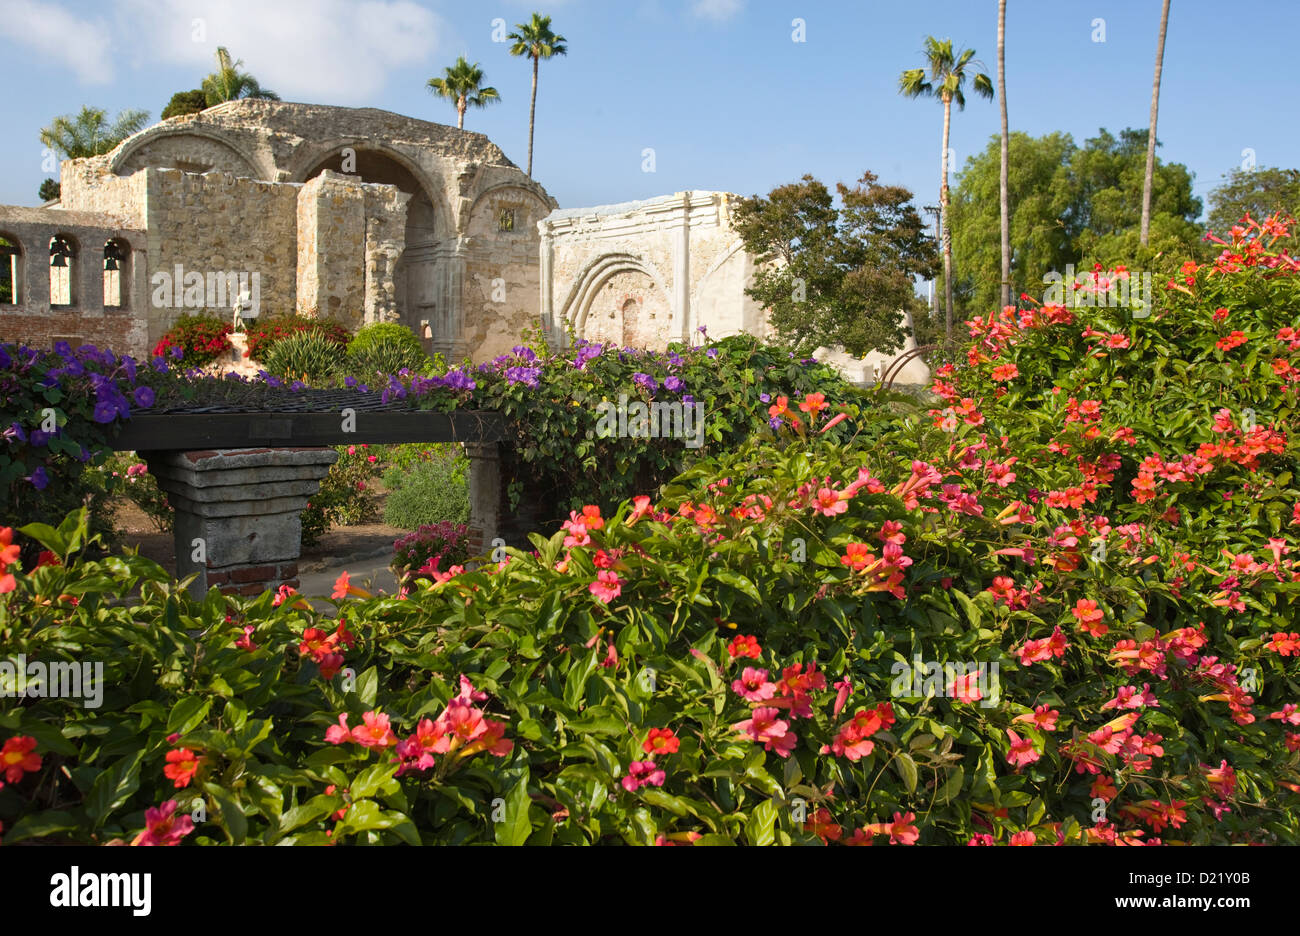 Wonderful FLOWERS ON GARDEN GREAT STONE CHURCH RUINS MISSION SAN JUAN CAPISTRANO ORANGE  COUNTY CALIFORNIA USA